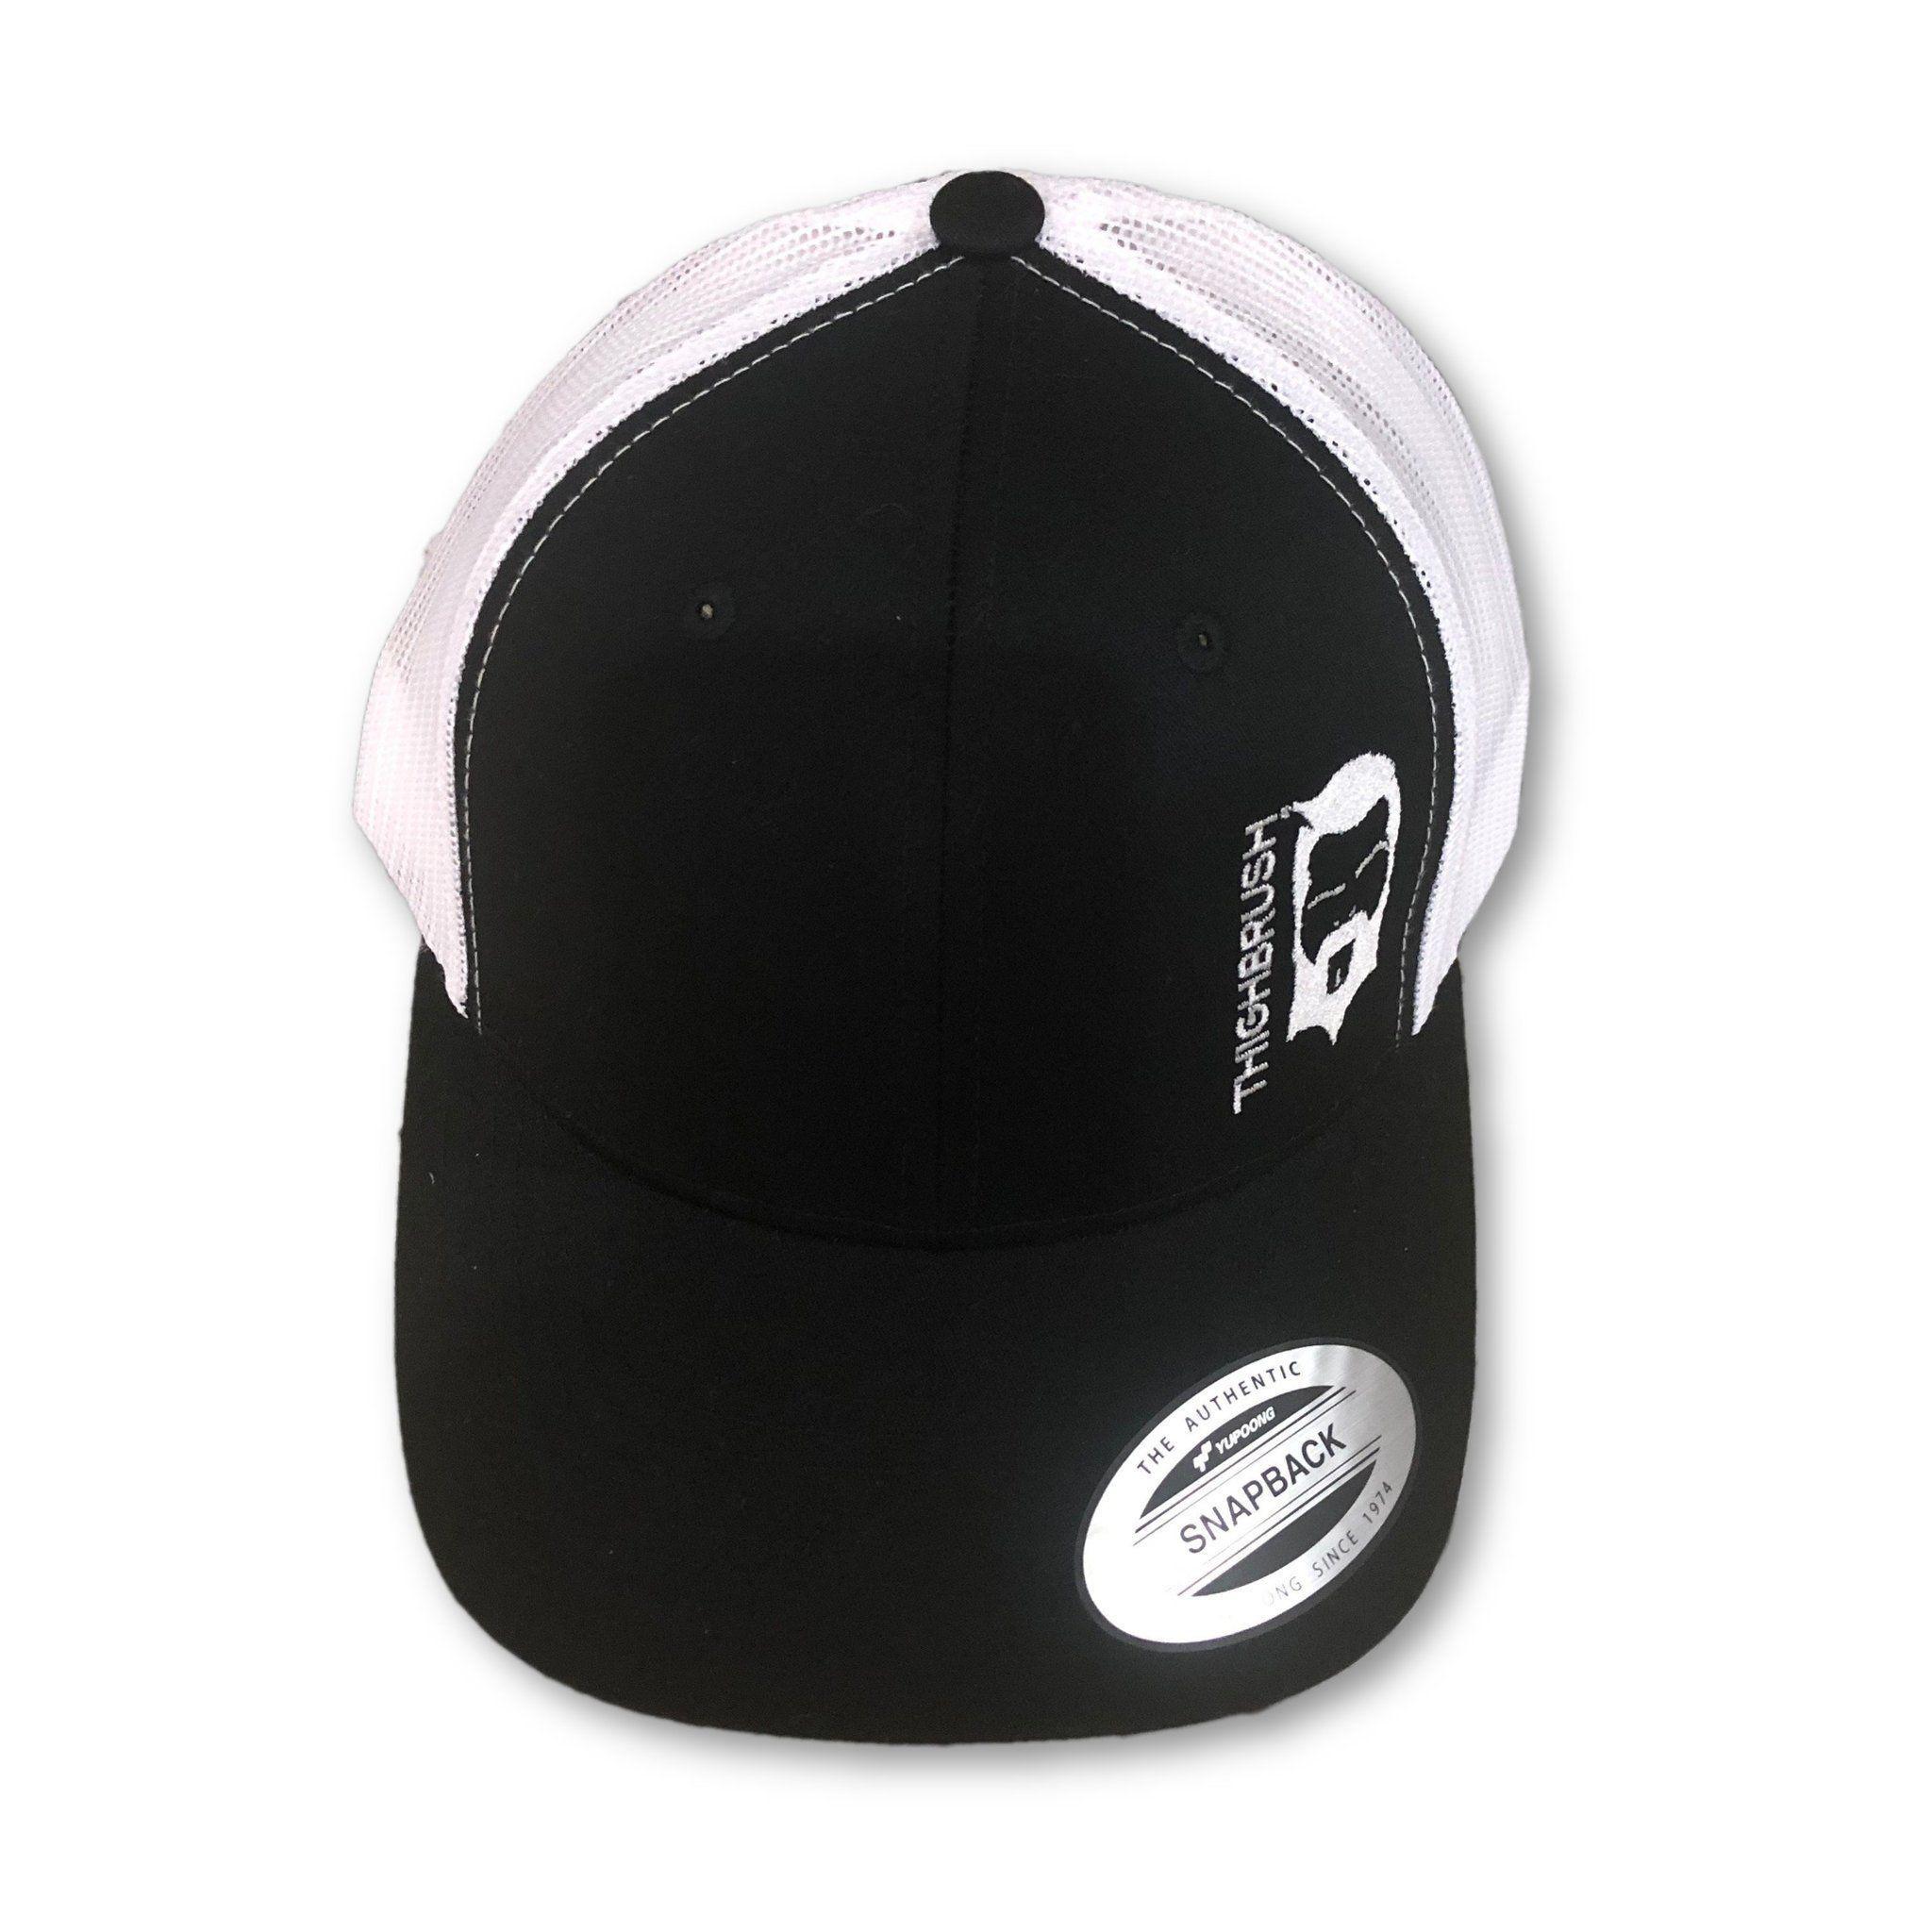 64bf194a303 THIGHBRUSH - Trucker Snapback Hat - Black and White - White Logo ...